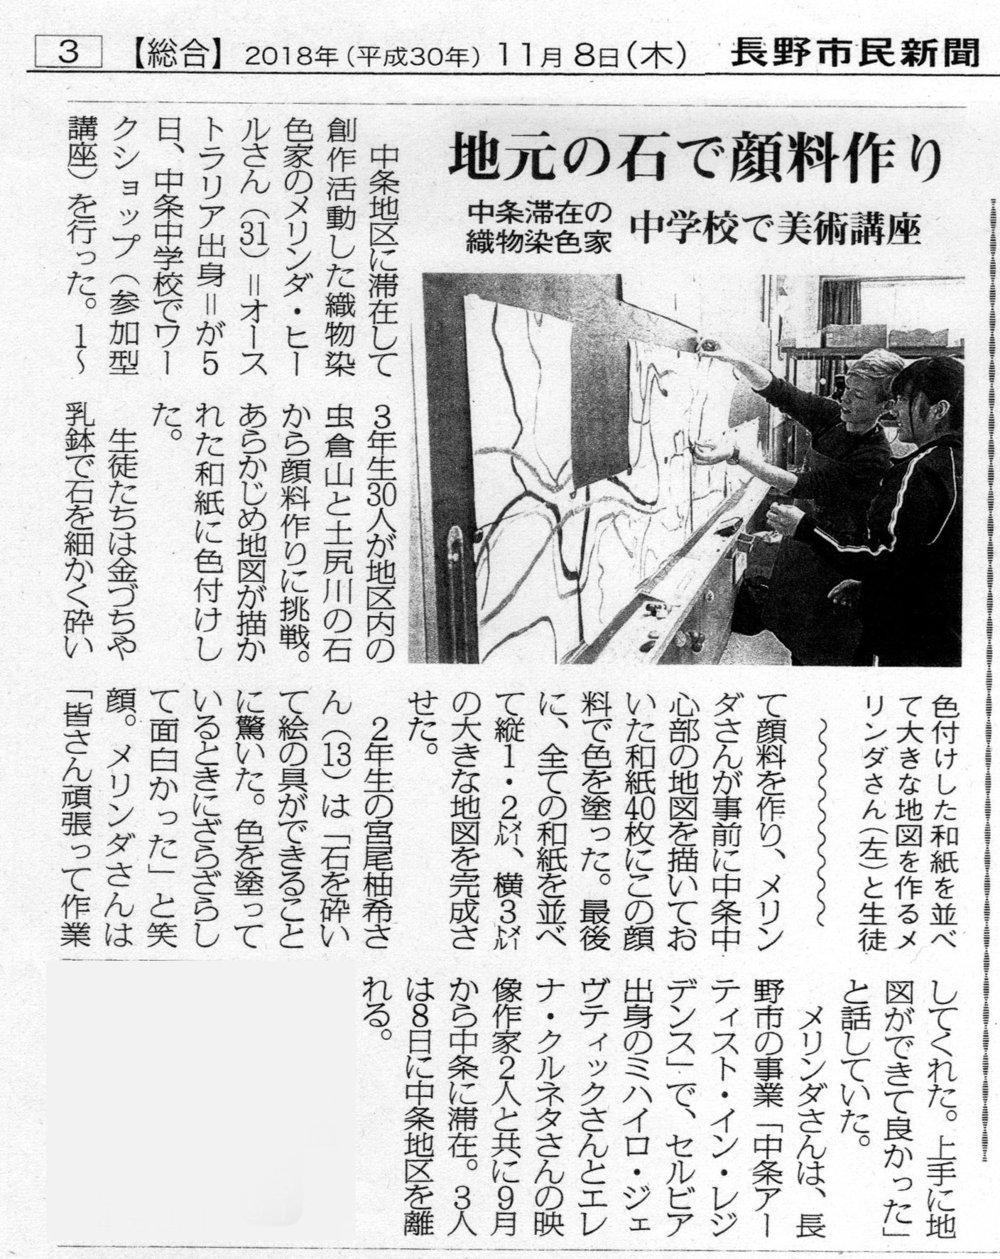 NaganoShiminShinbun-Thurs-8-Nov-18crop.jpg